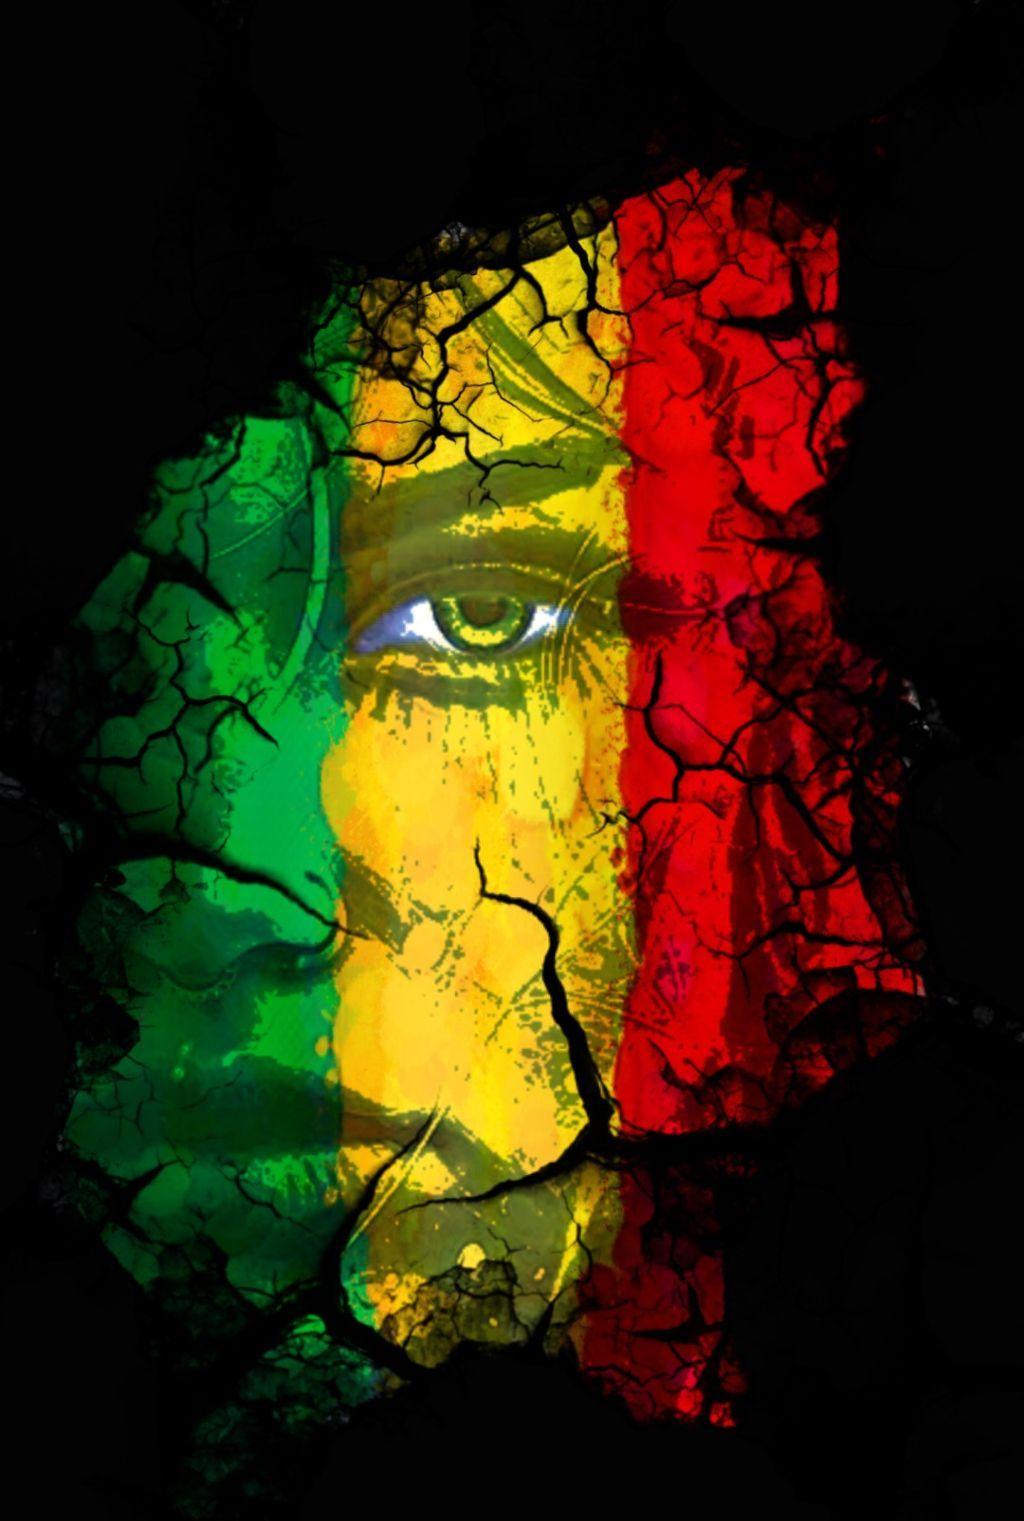 Dubrootsgirlcreation Rasta Dubrootsgirl Picsart Reggae Art Bob Marley Art Rasta Art